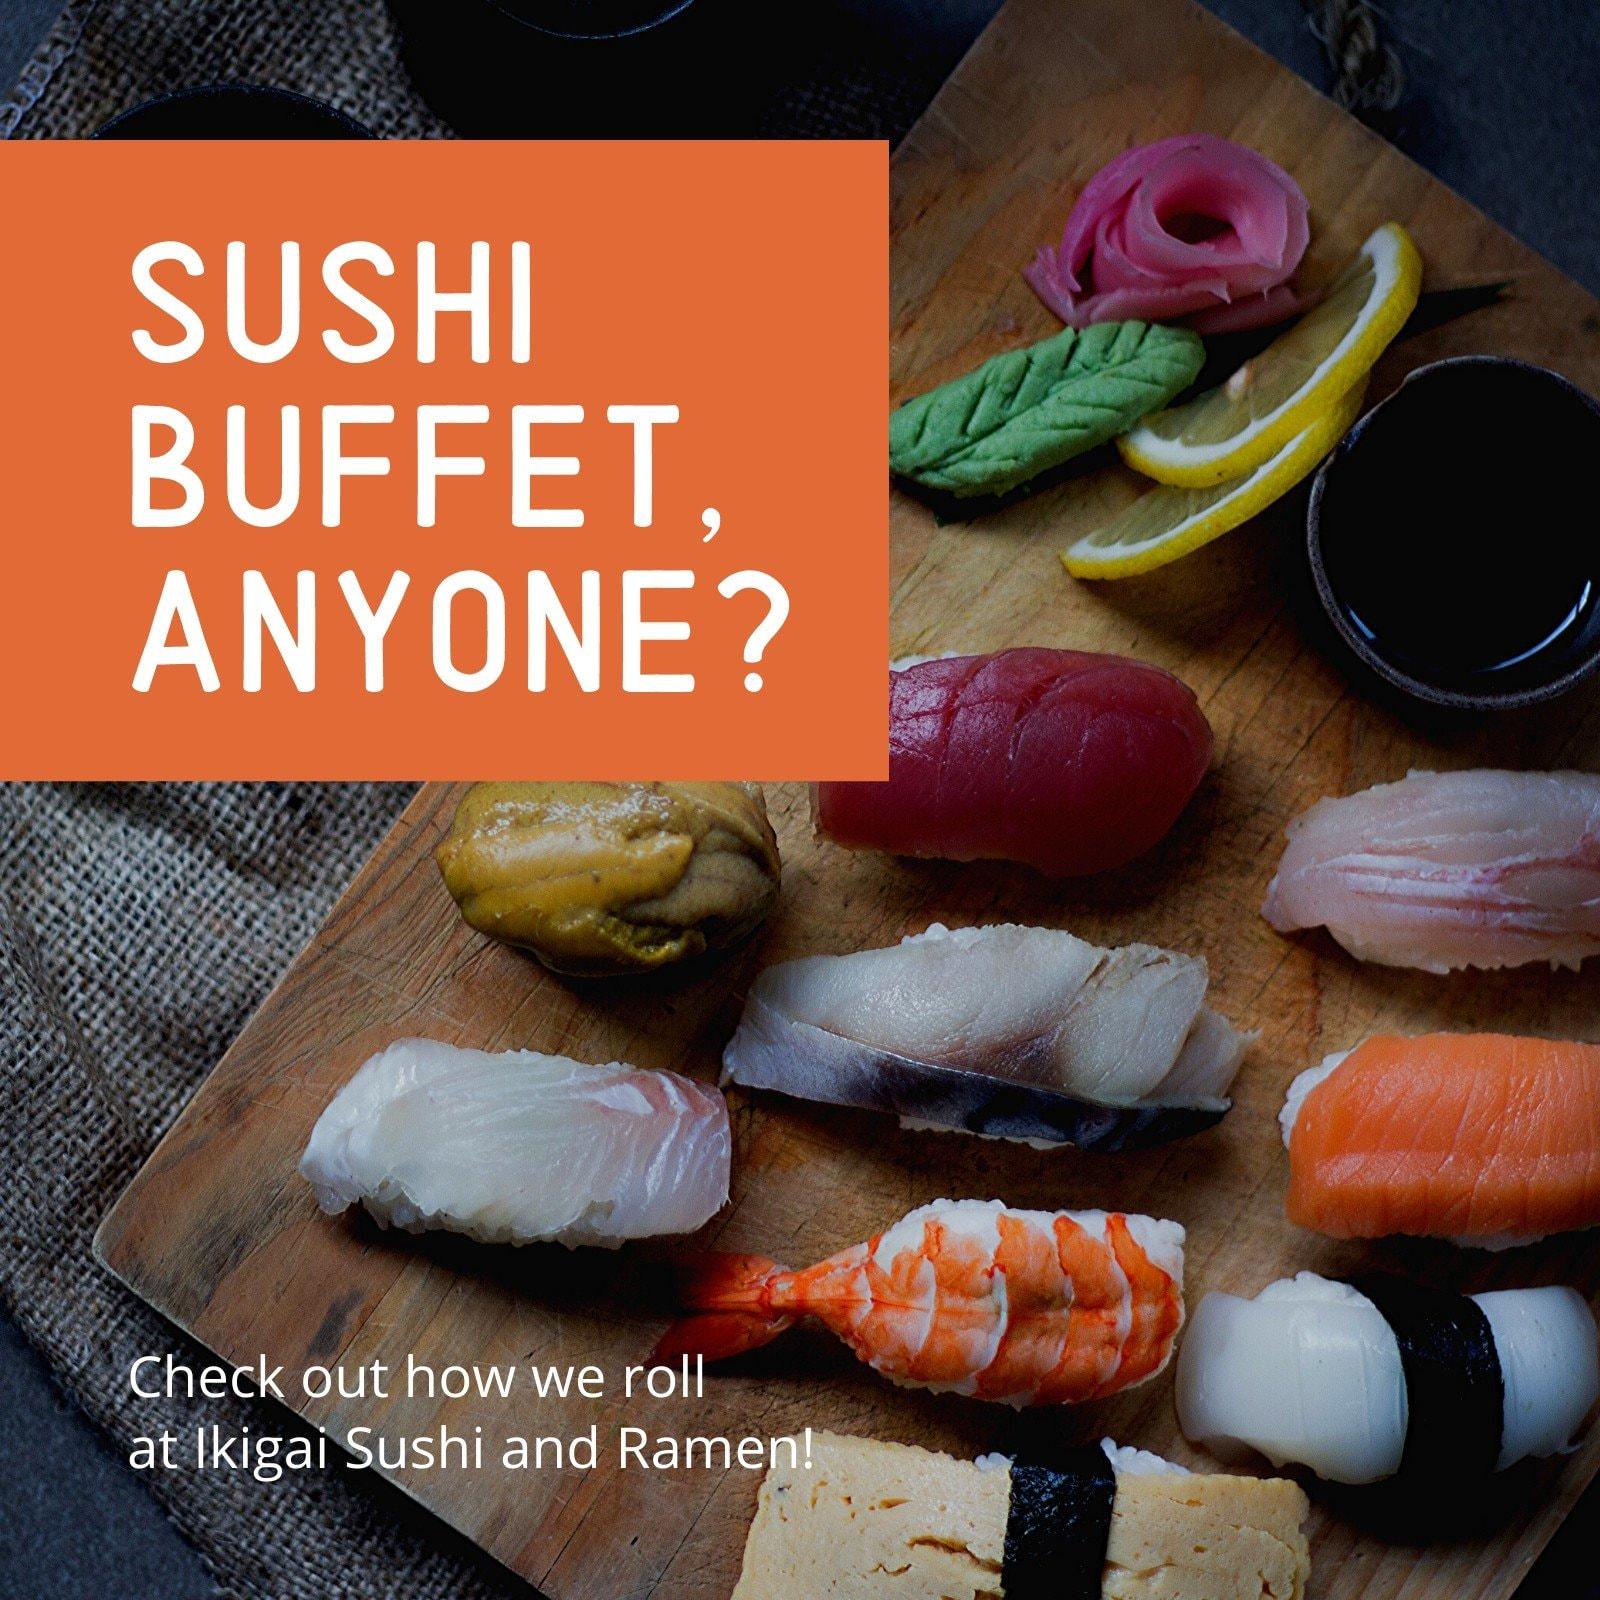 Japanese Sushi Photo Food Instagram Post